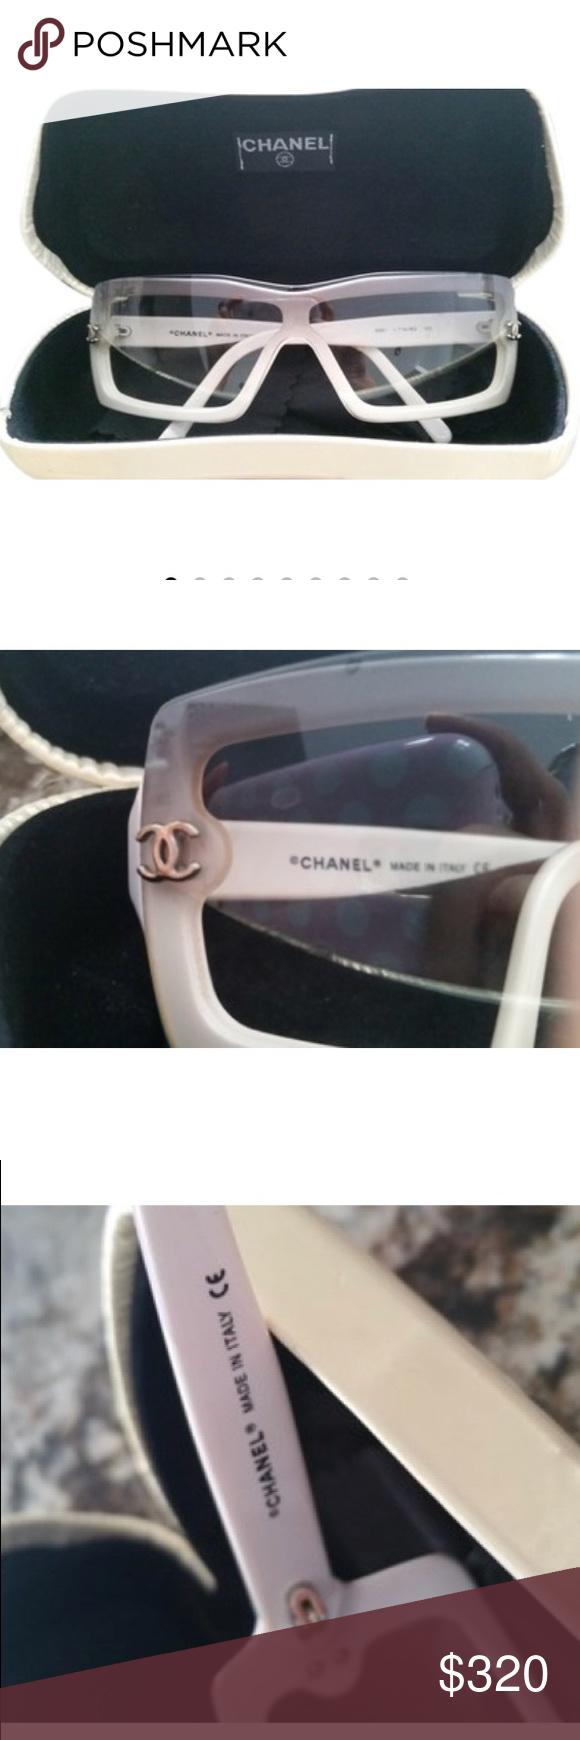 714b4485b8db Chanel White and Smokey Gray Sunglasses Chanel sunglasses. White and gray.  5067. Great condition. Comes with a Chanel case. CHANEL Accessories  Sunglasses